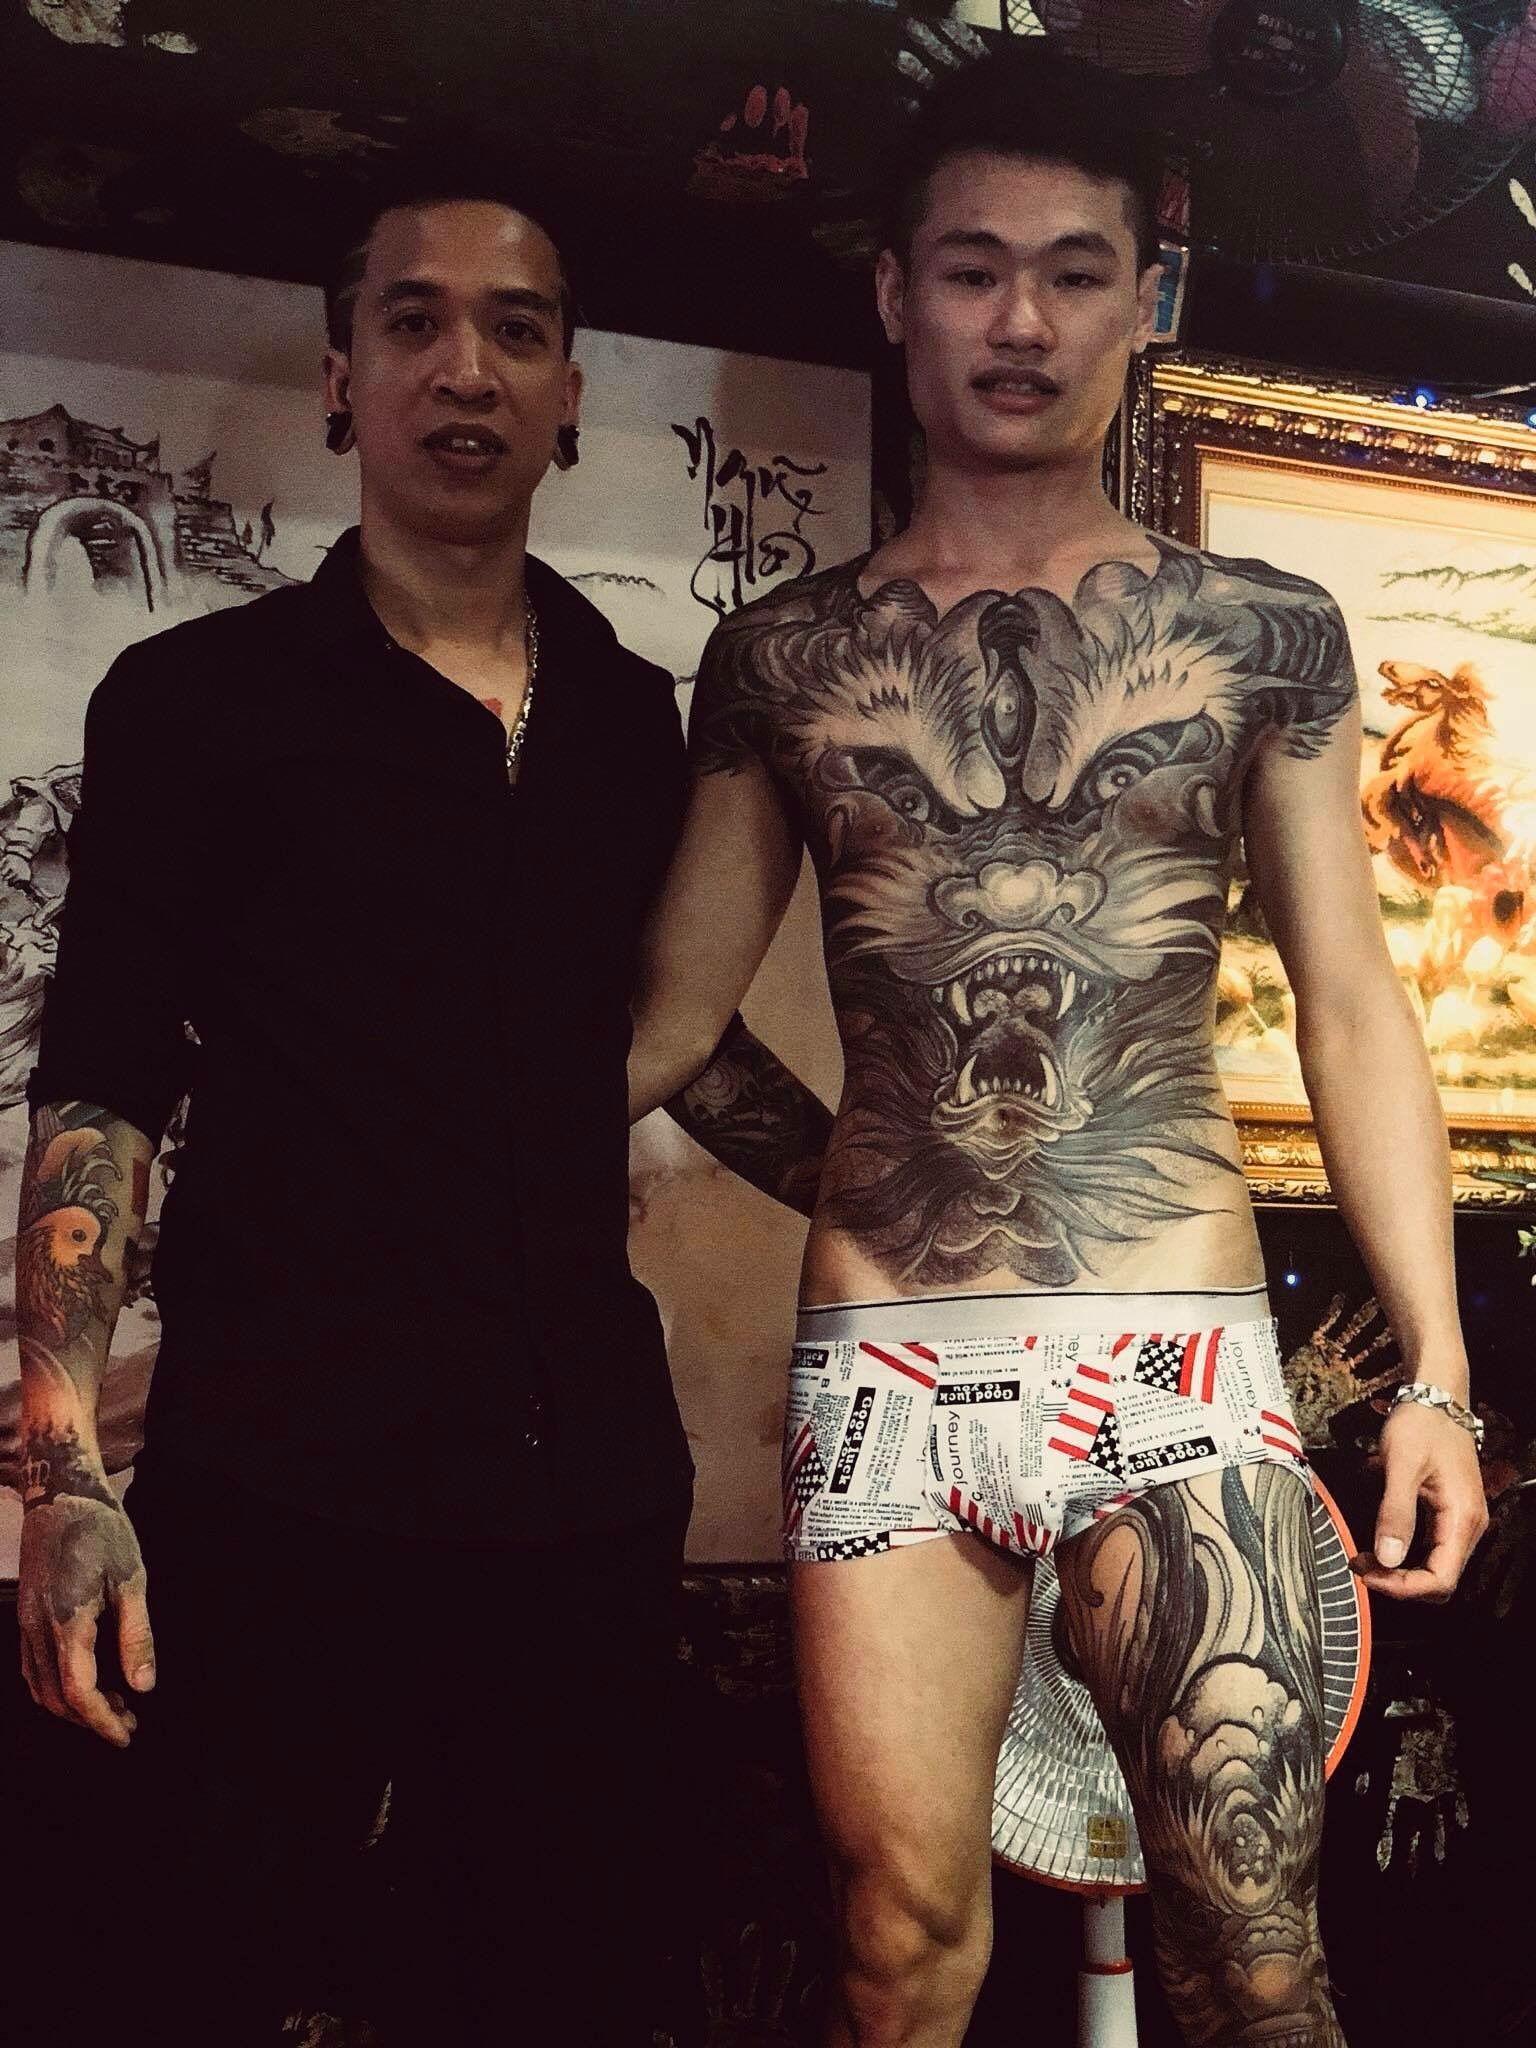 Man Yakuza Cigar Tattoo: Getting Inked: How Tattoos Became Popular